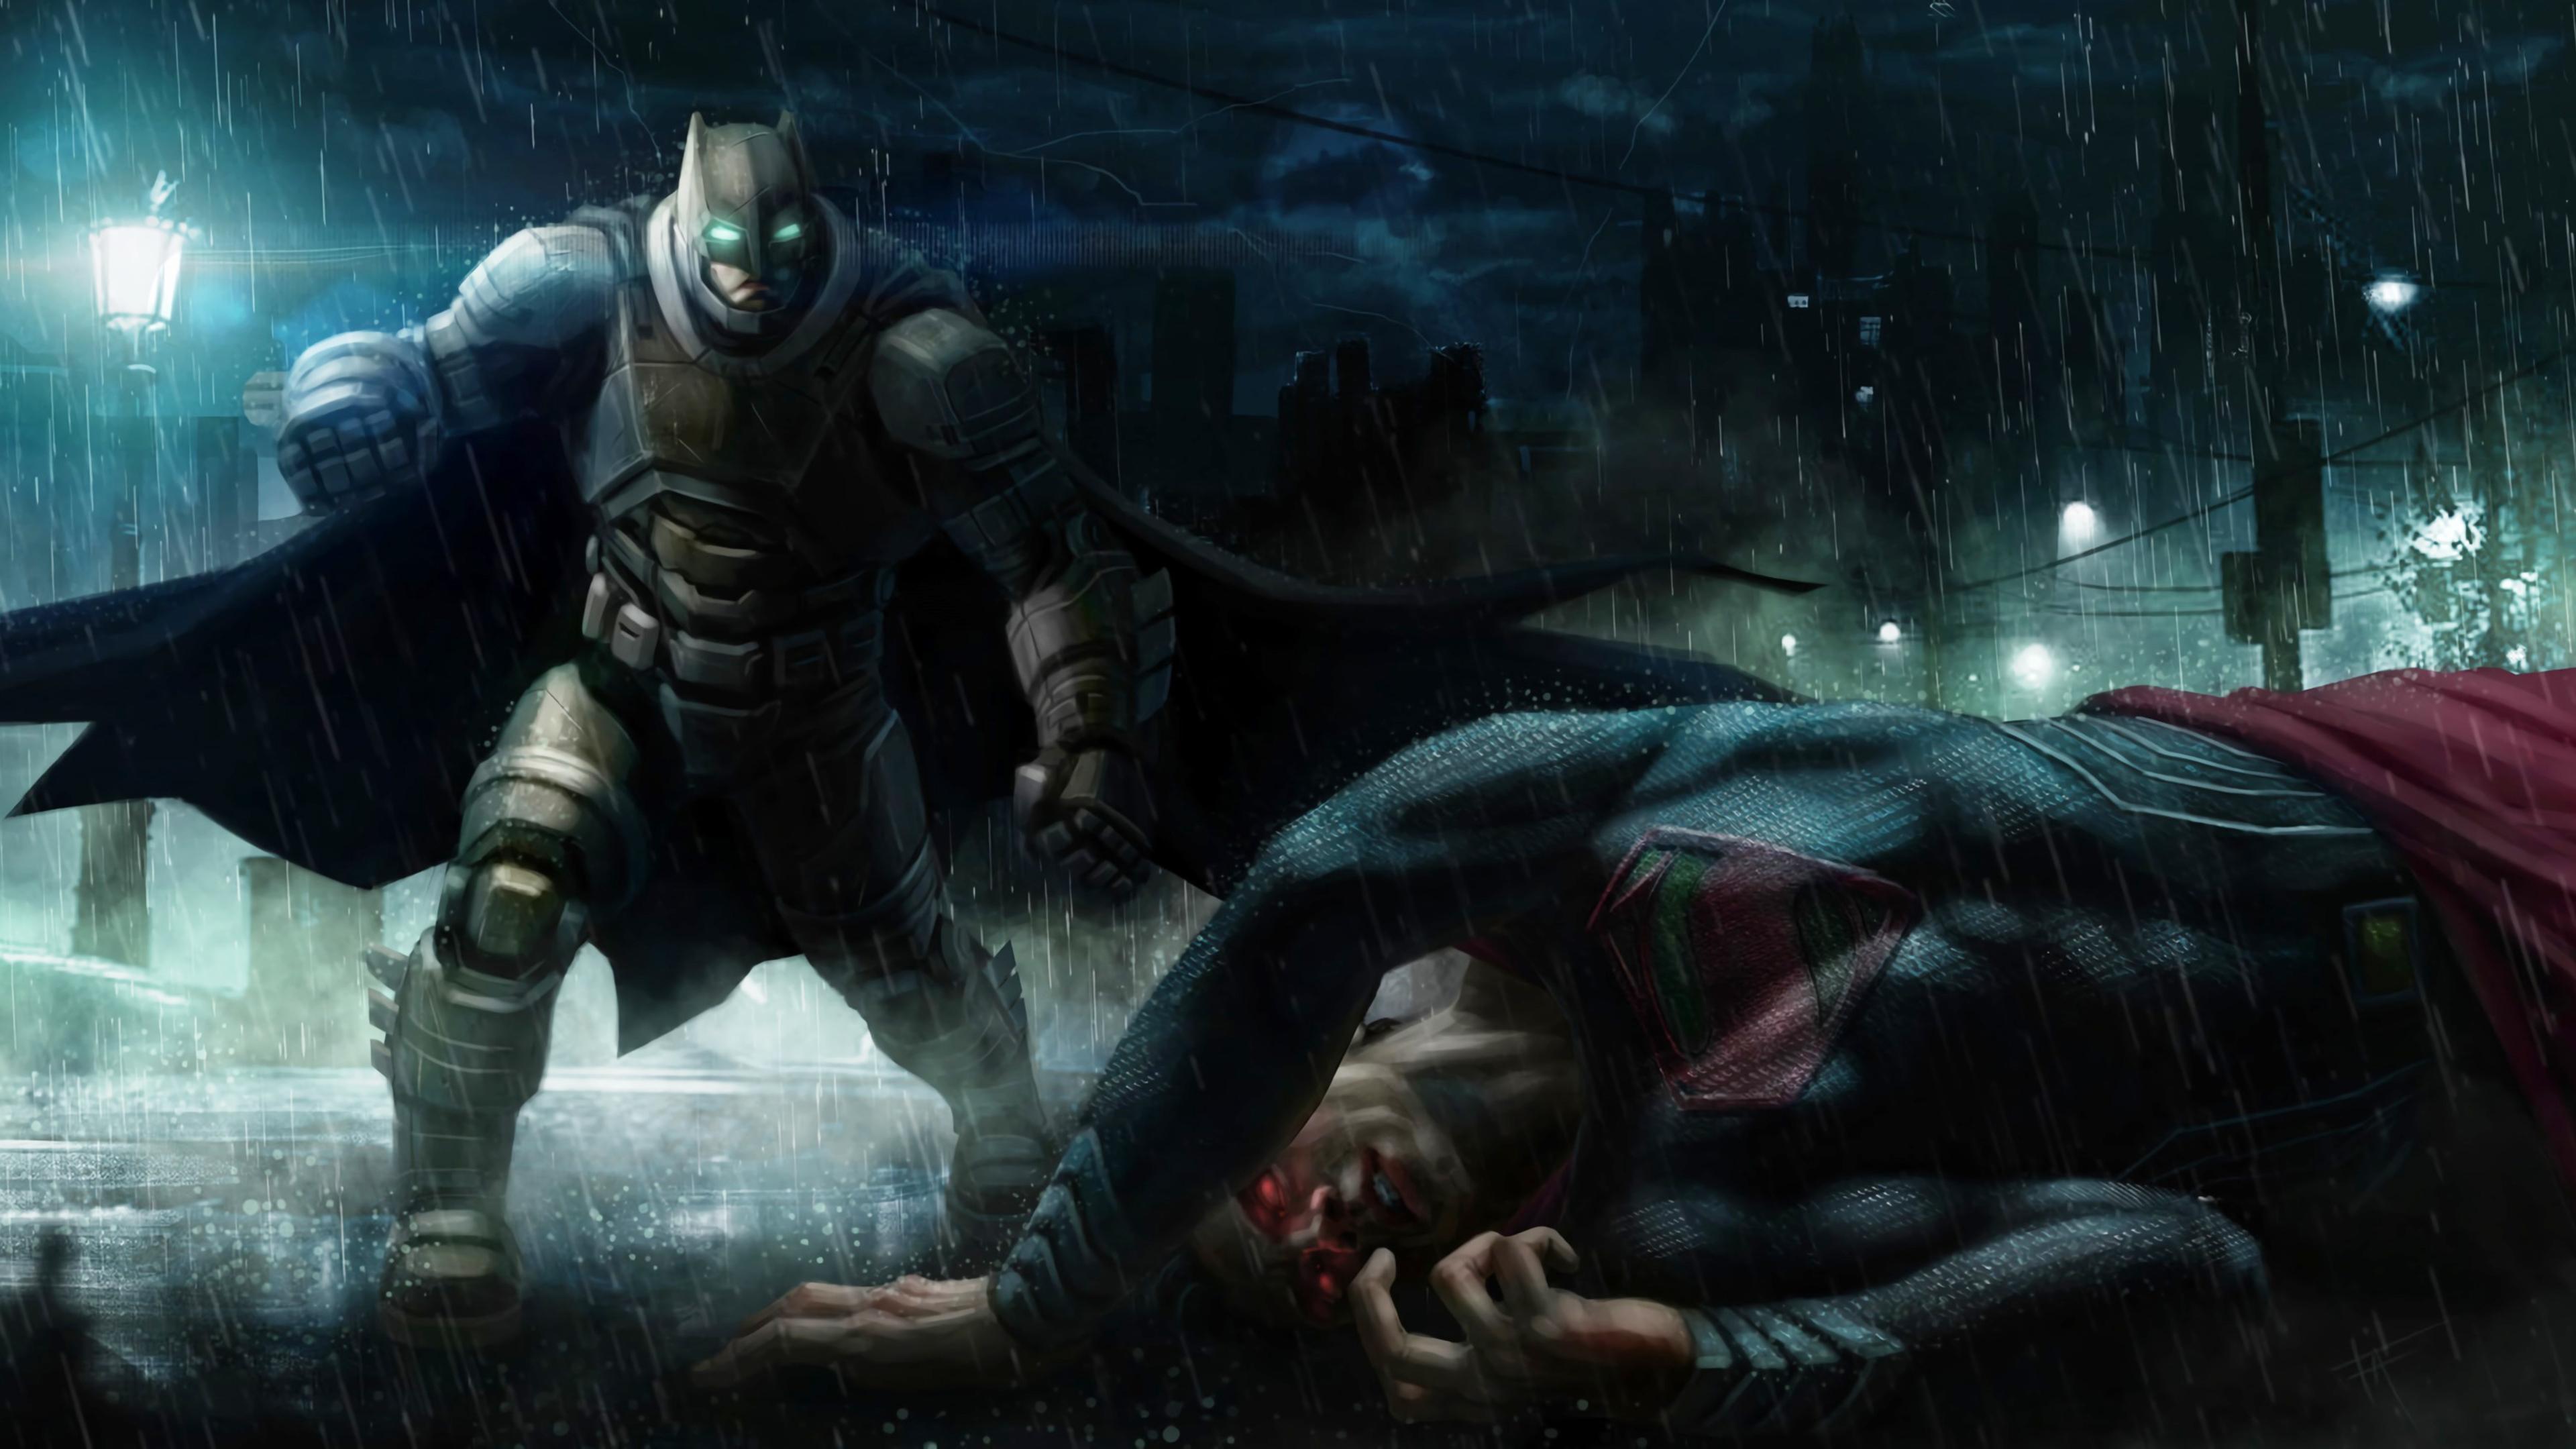 batman kills superman 1568054840 - Batman Kills Superman - superman wallpapers, superheroes wallpapers, hd-wallpapers, digital art wallpapers, batman wallpapers, artwork wallpapers, 4k-wallpapers